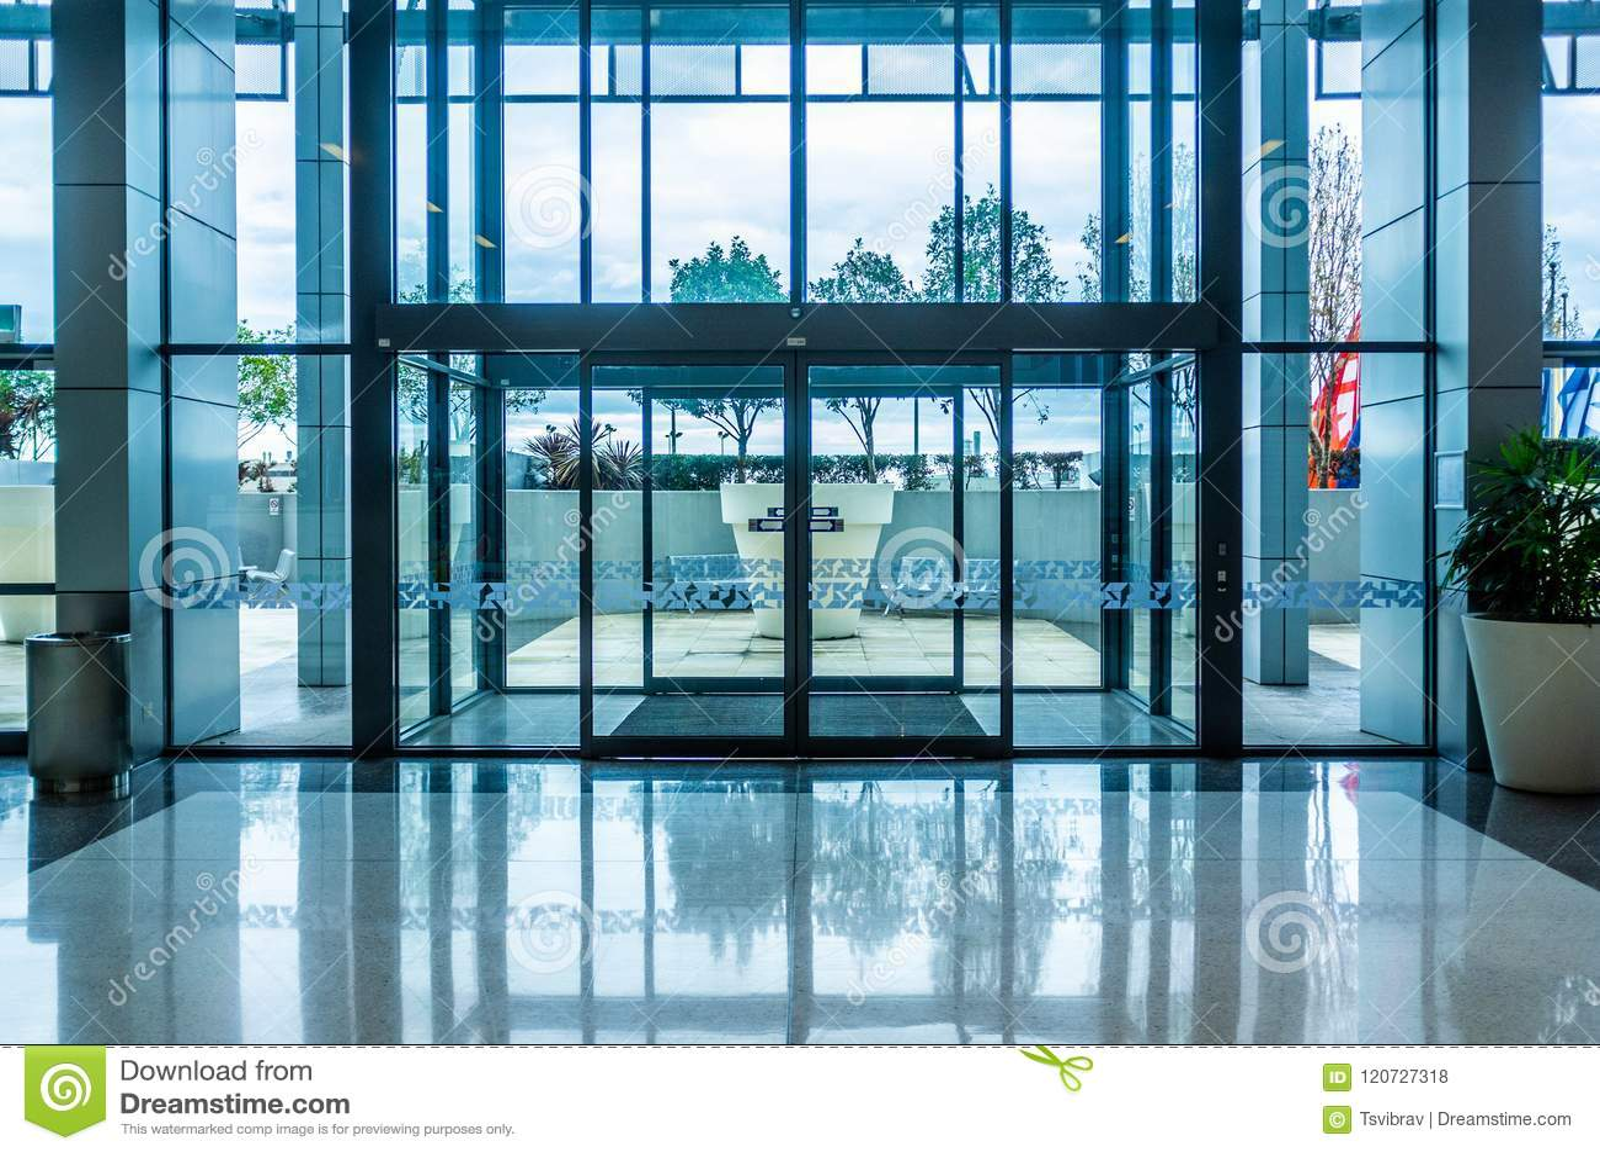 Glass Automatic Sliding Doors Entrance Stock Photo Image Of